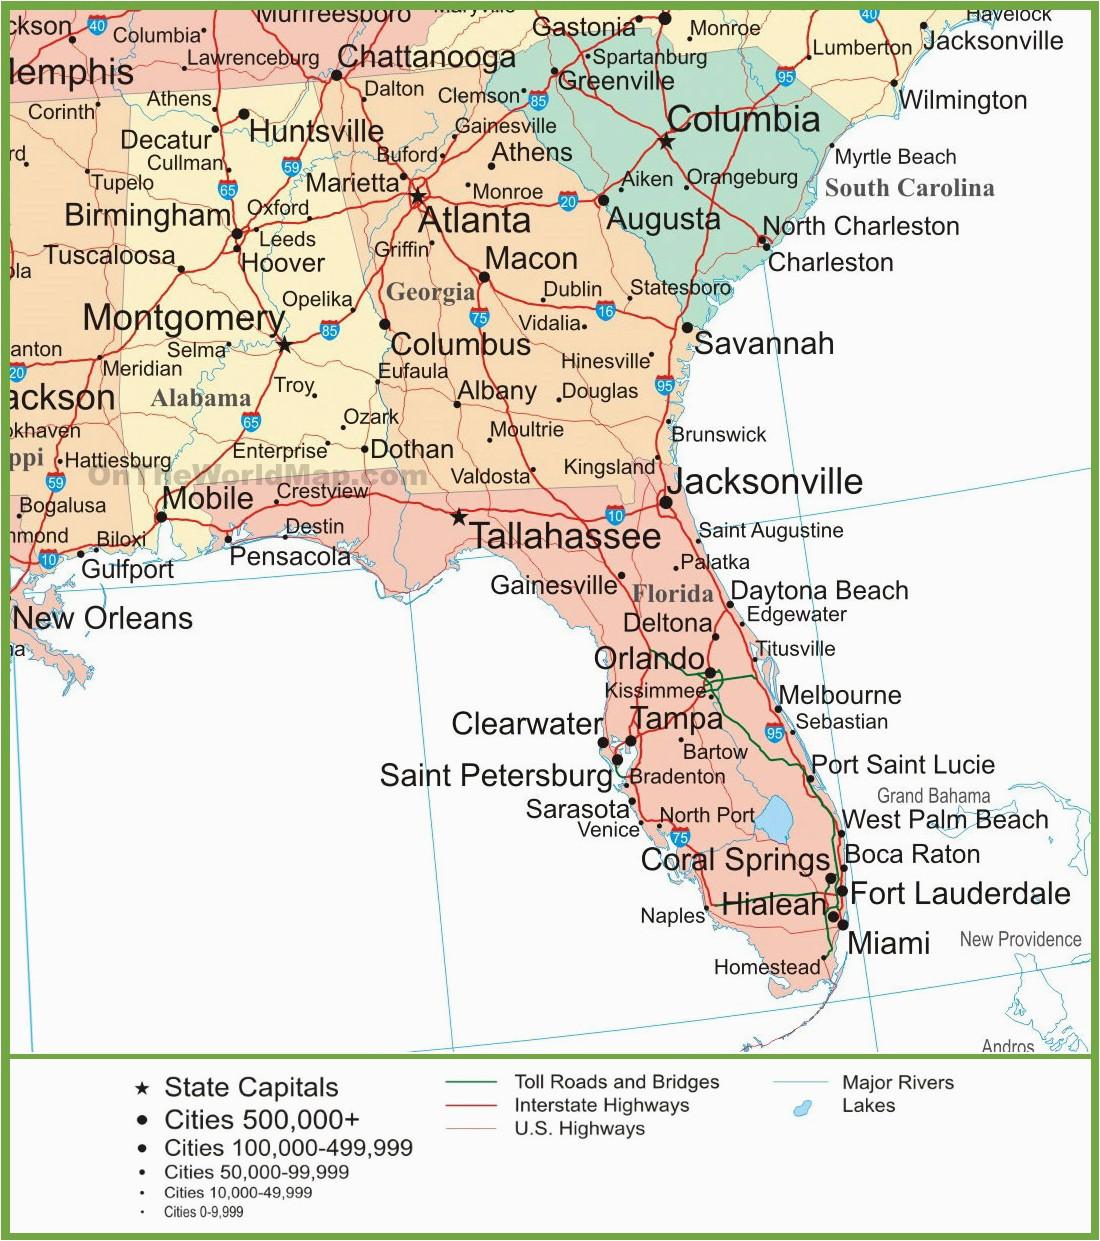 Map Of Georgia And Florida Coast.Map Of Georgia And Florida Coast Secretmuseum